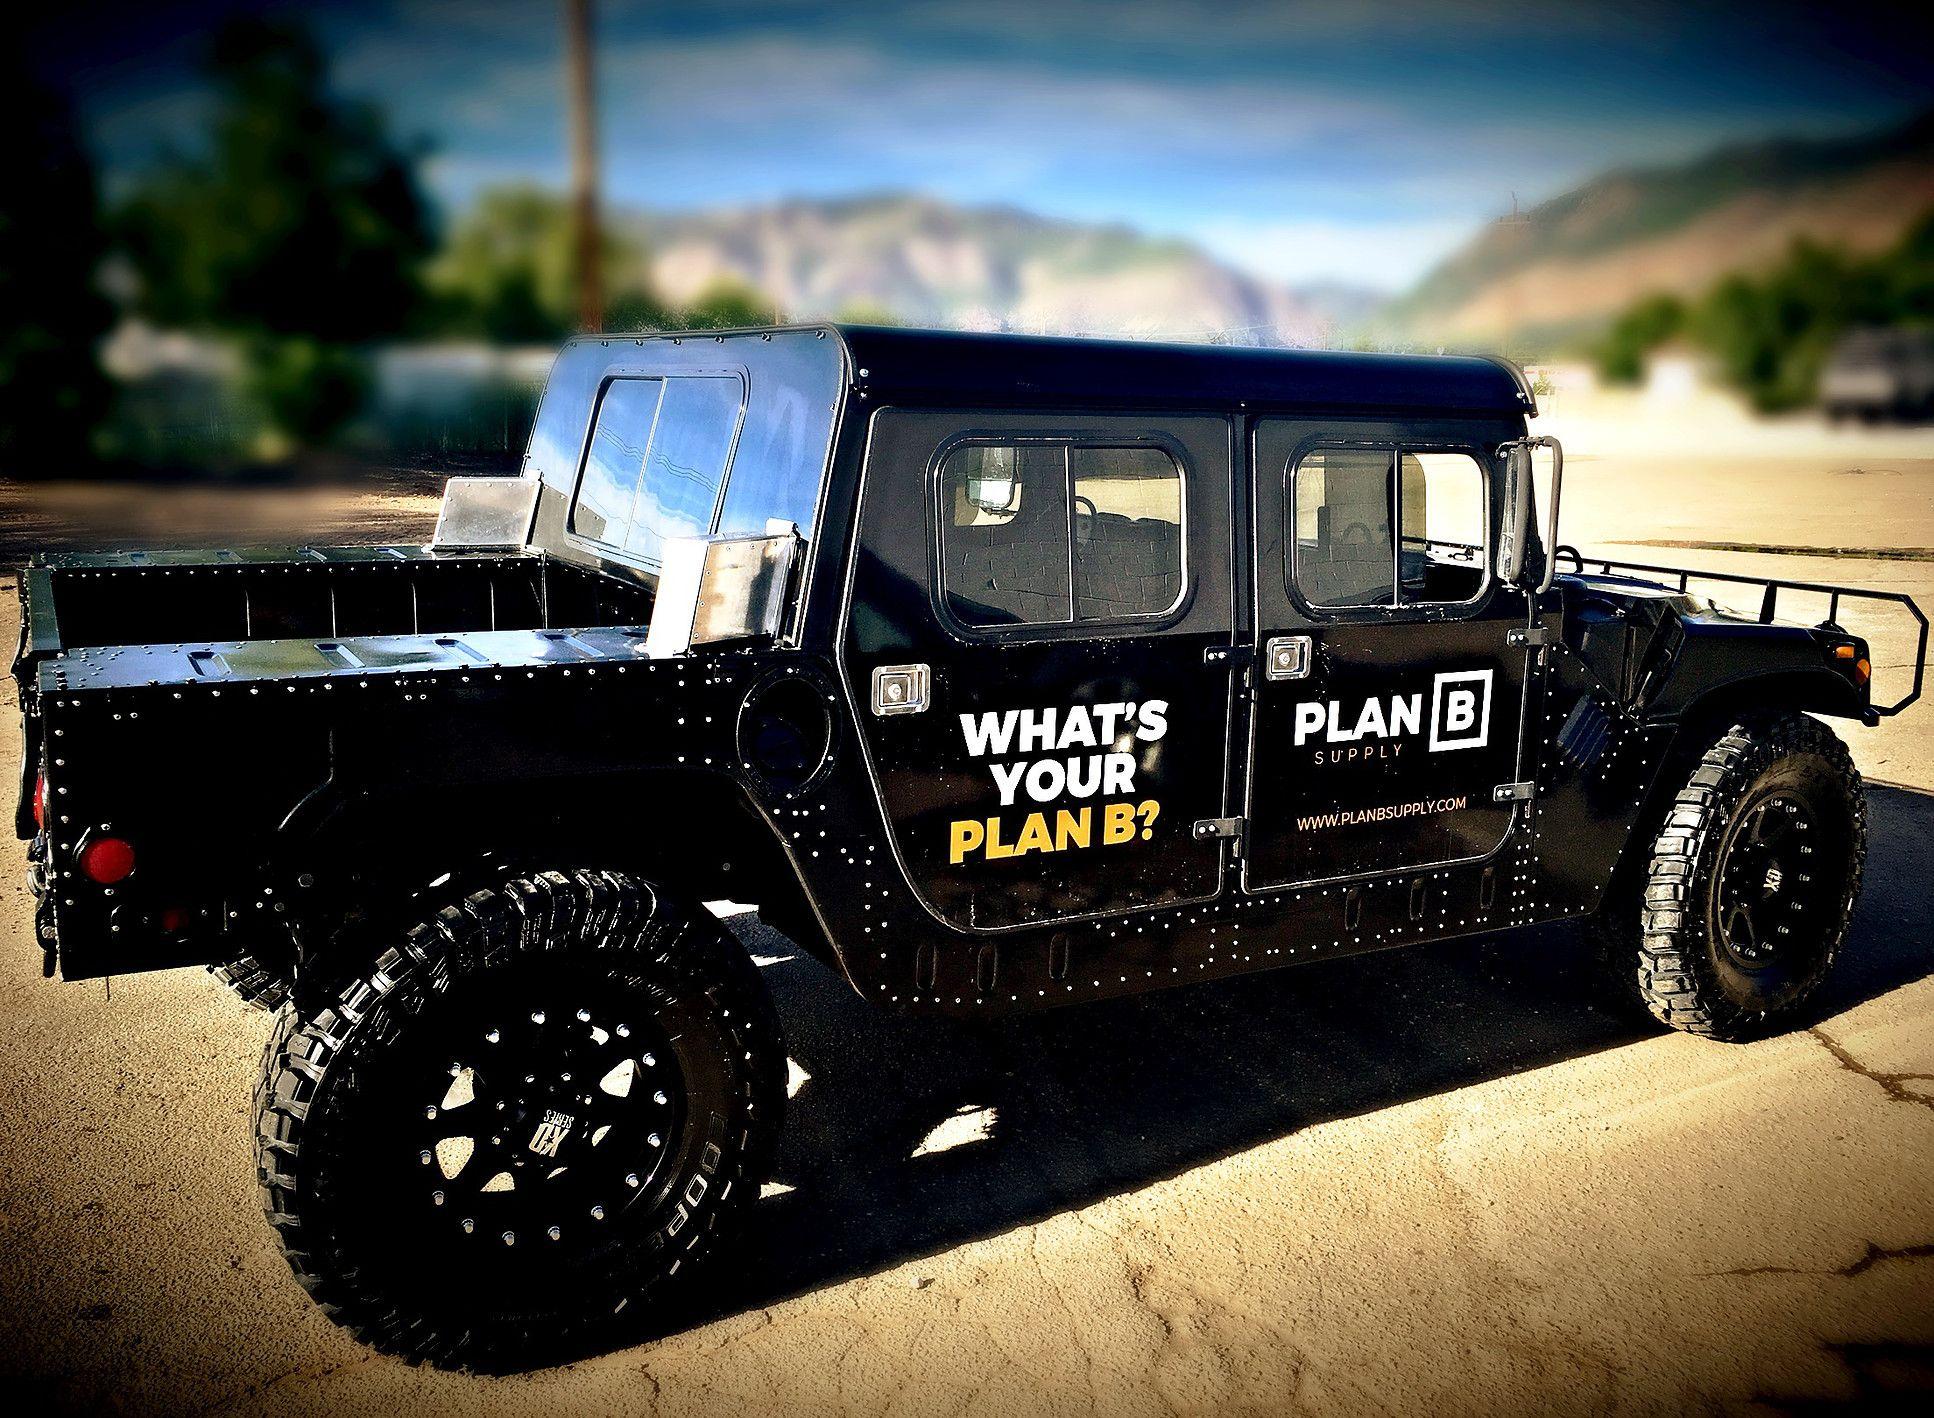 Plan B Supply 6x6 Disaster Trucks And Emergency Gear Trucks Emergency Gear Hummer For Sale